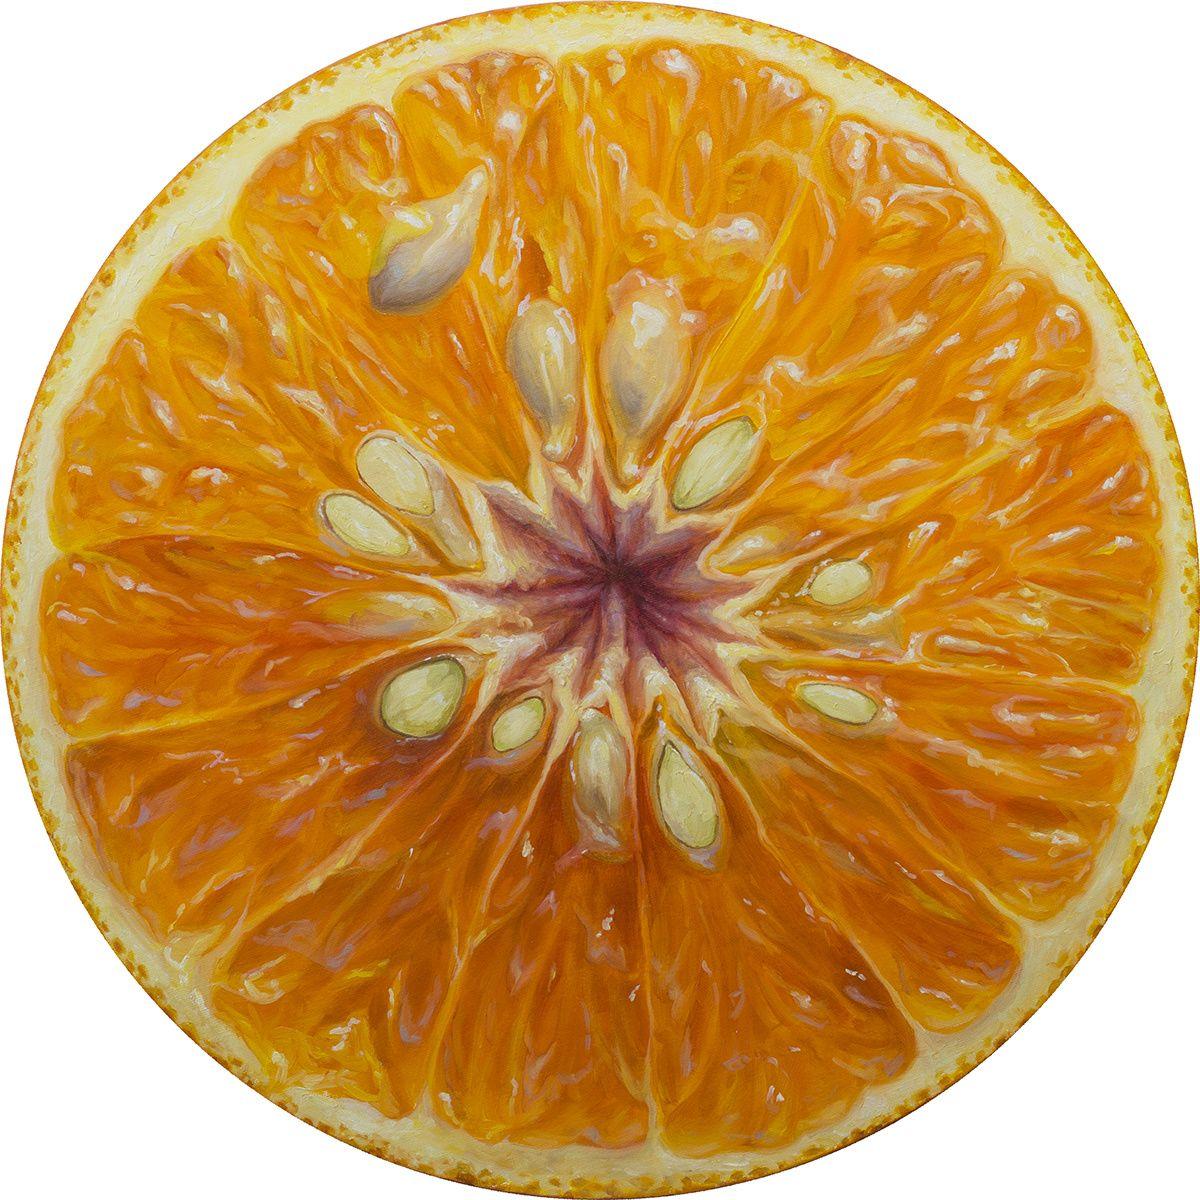 naranja alonsa guevara